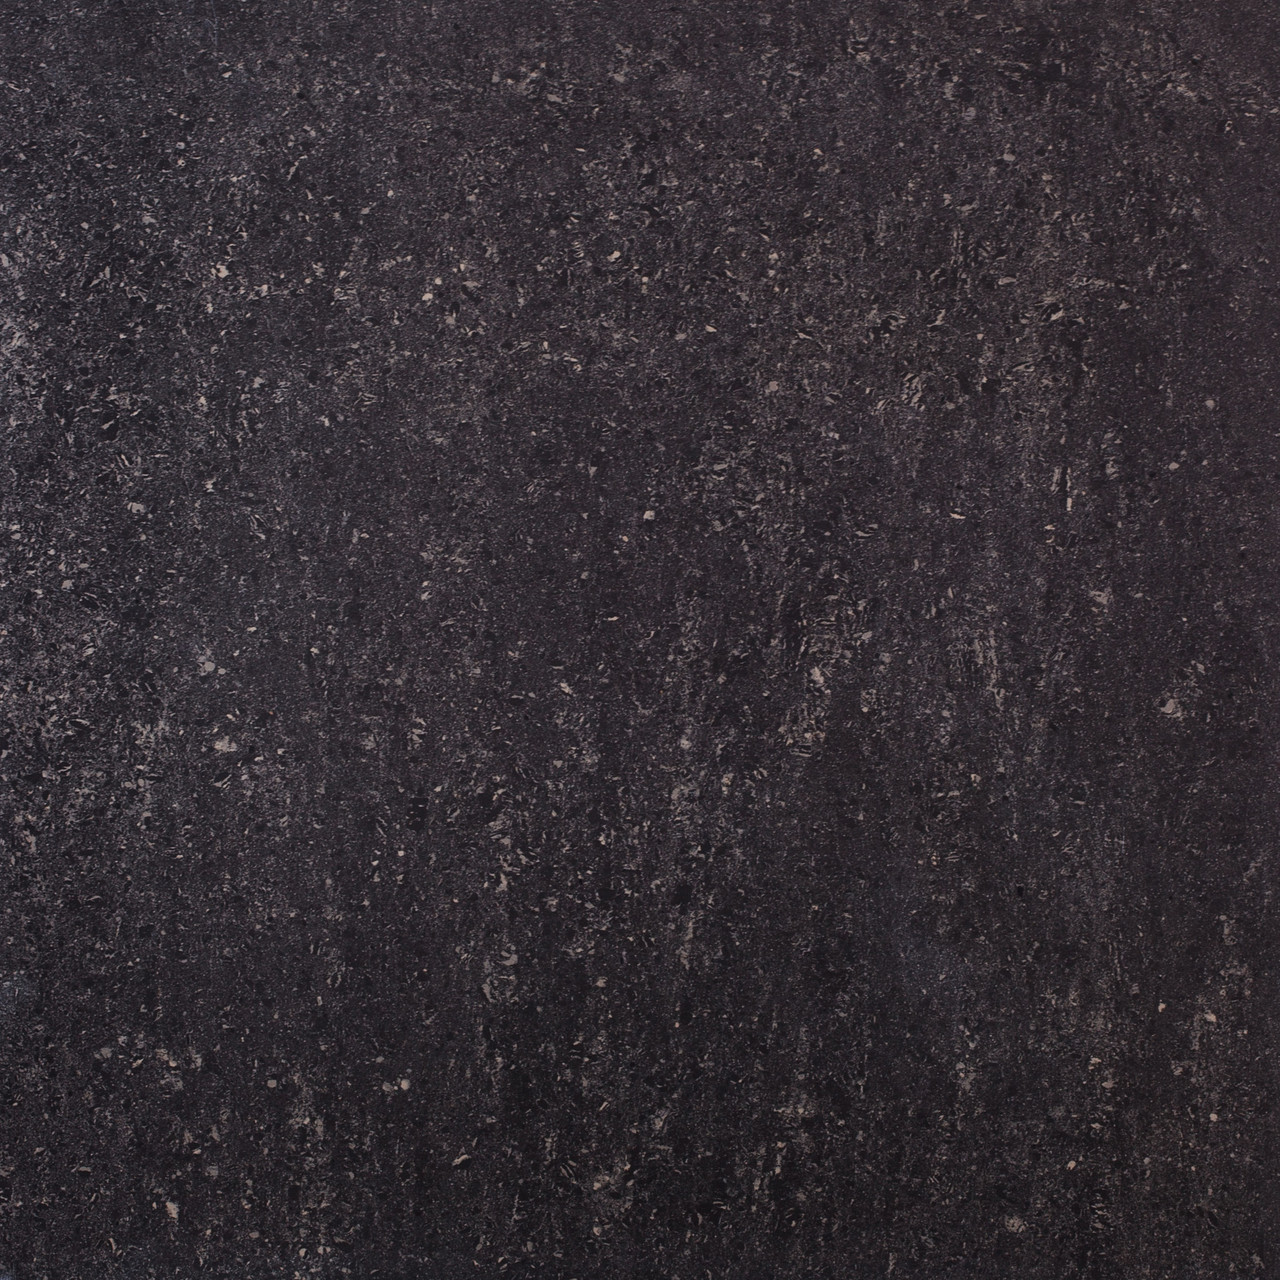 Керамогранит серый травертин, 60х60